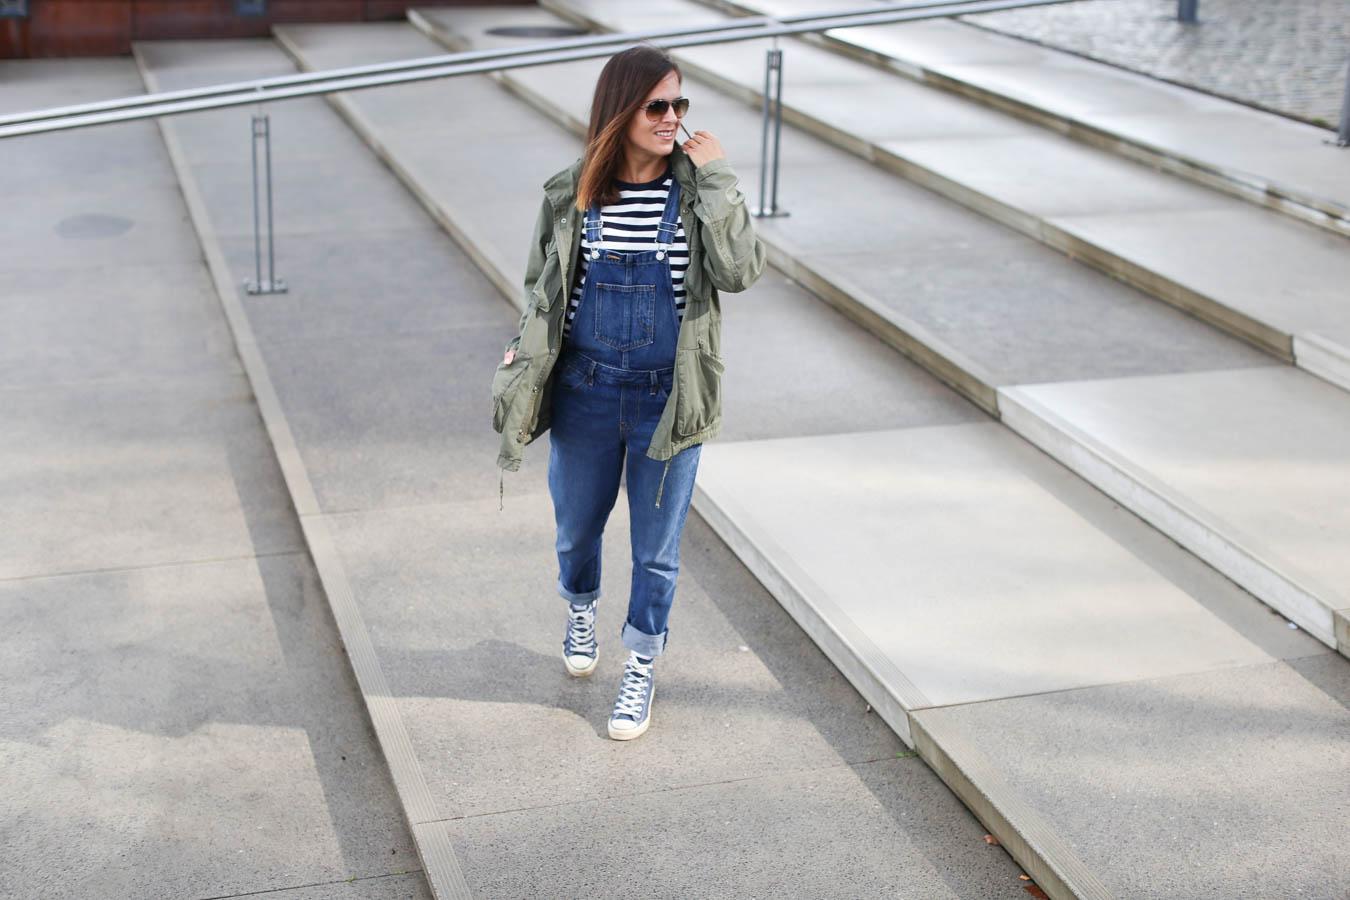 Outfit Latzhose richtig kombinieren im Herbst